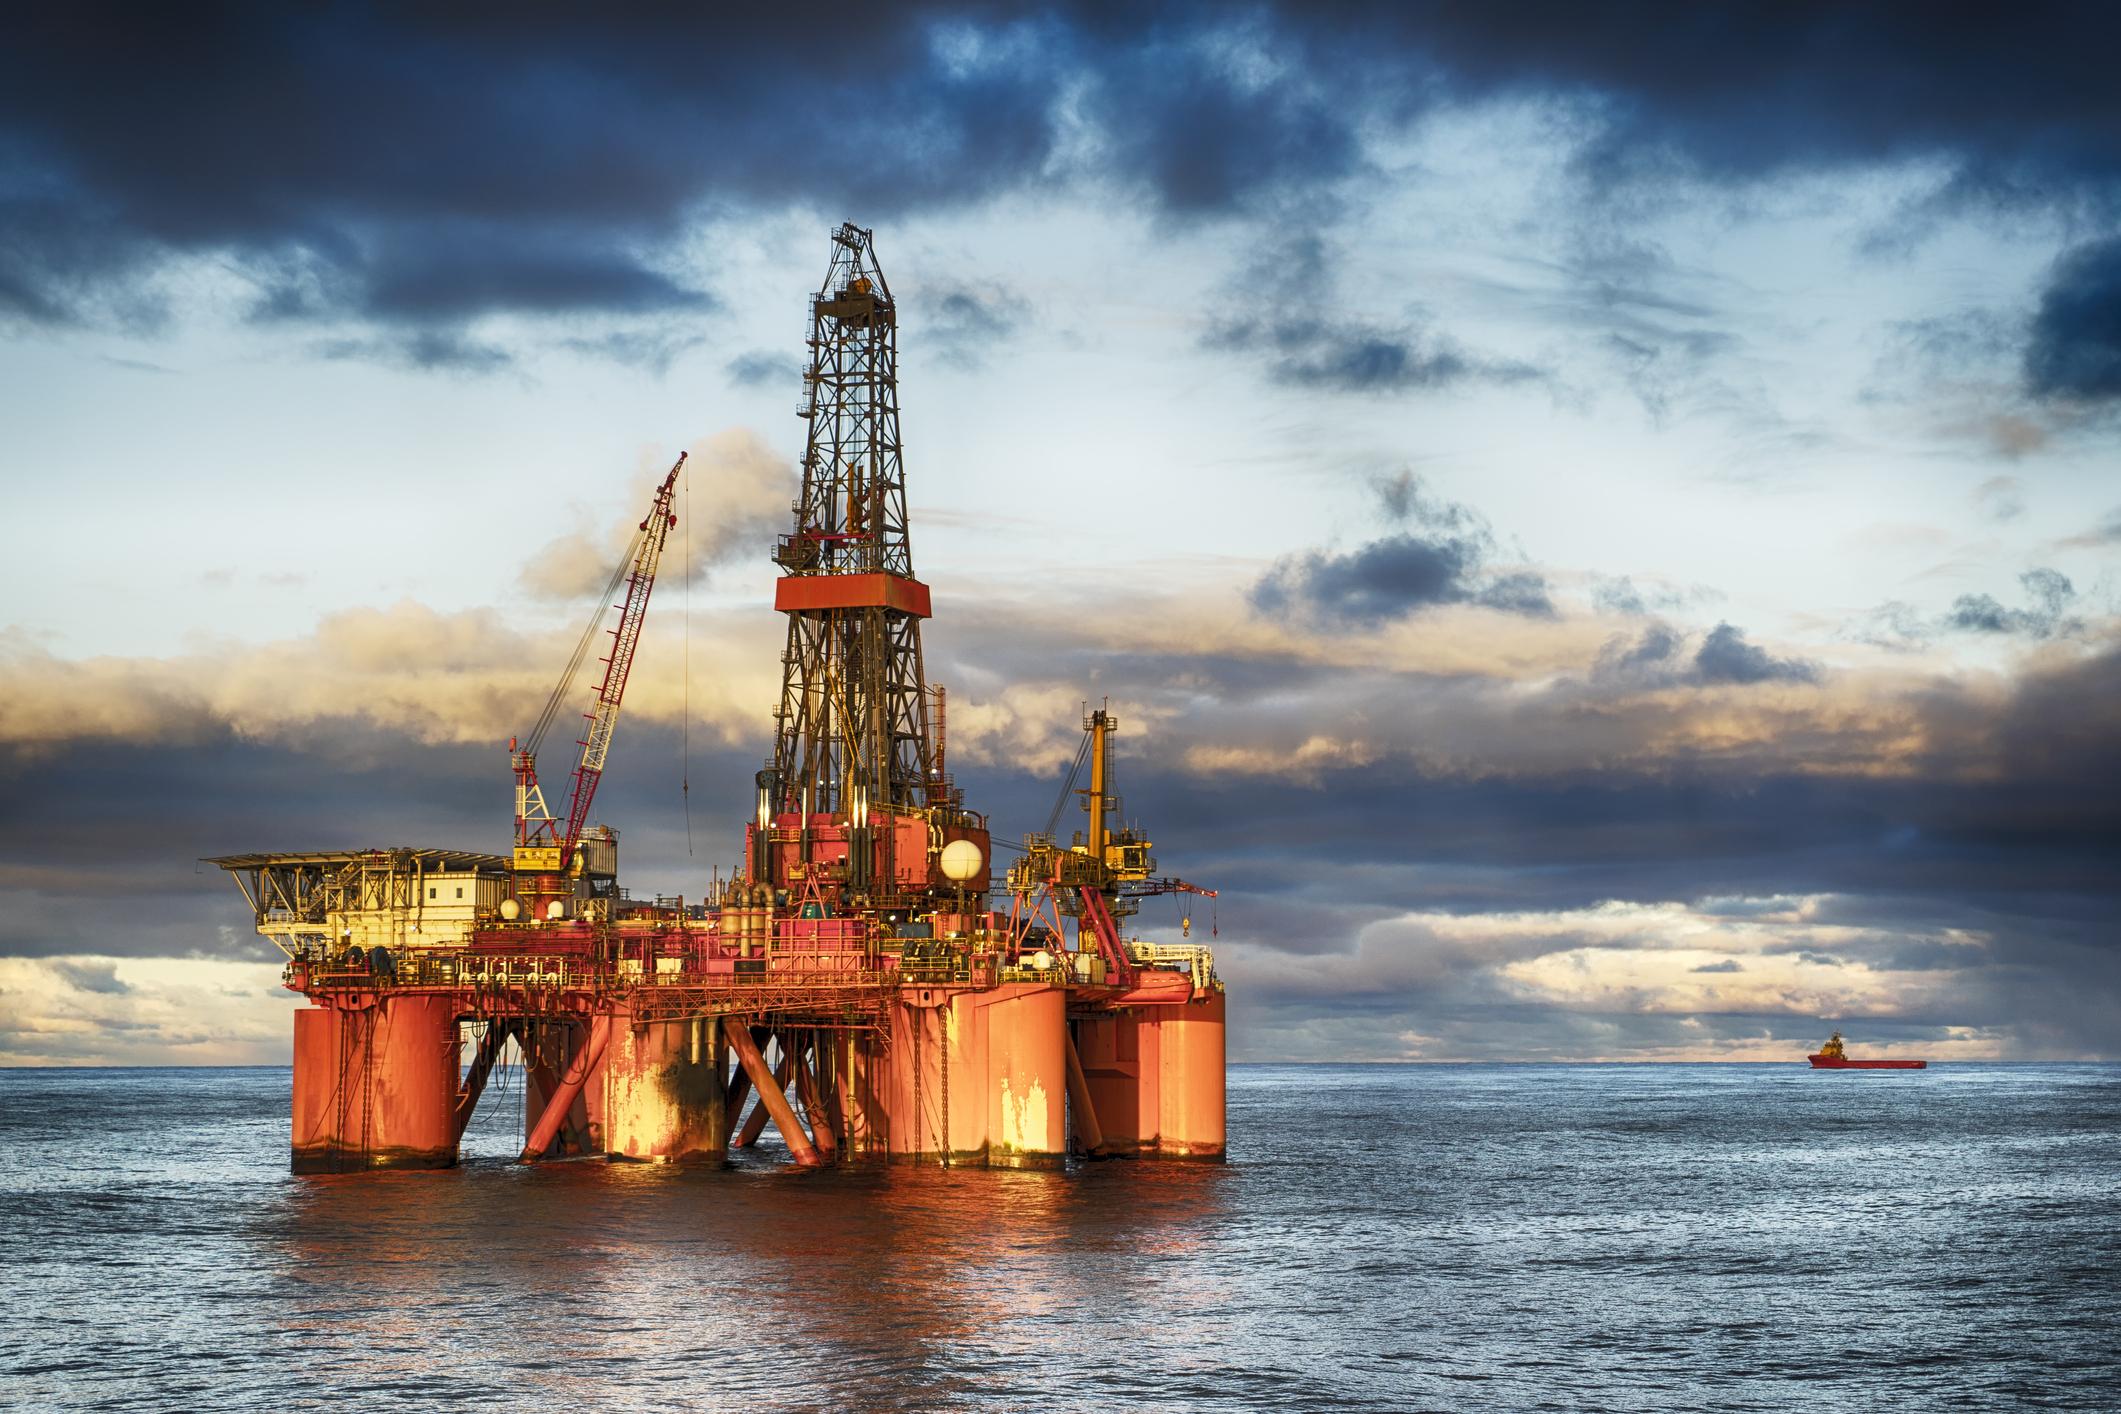 An offshore oil drilling platform